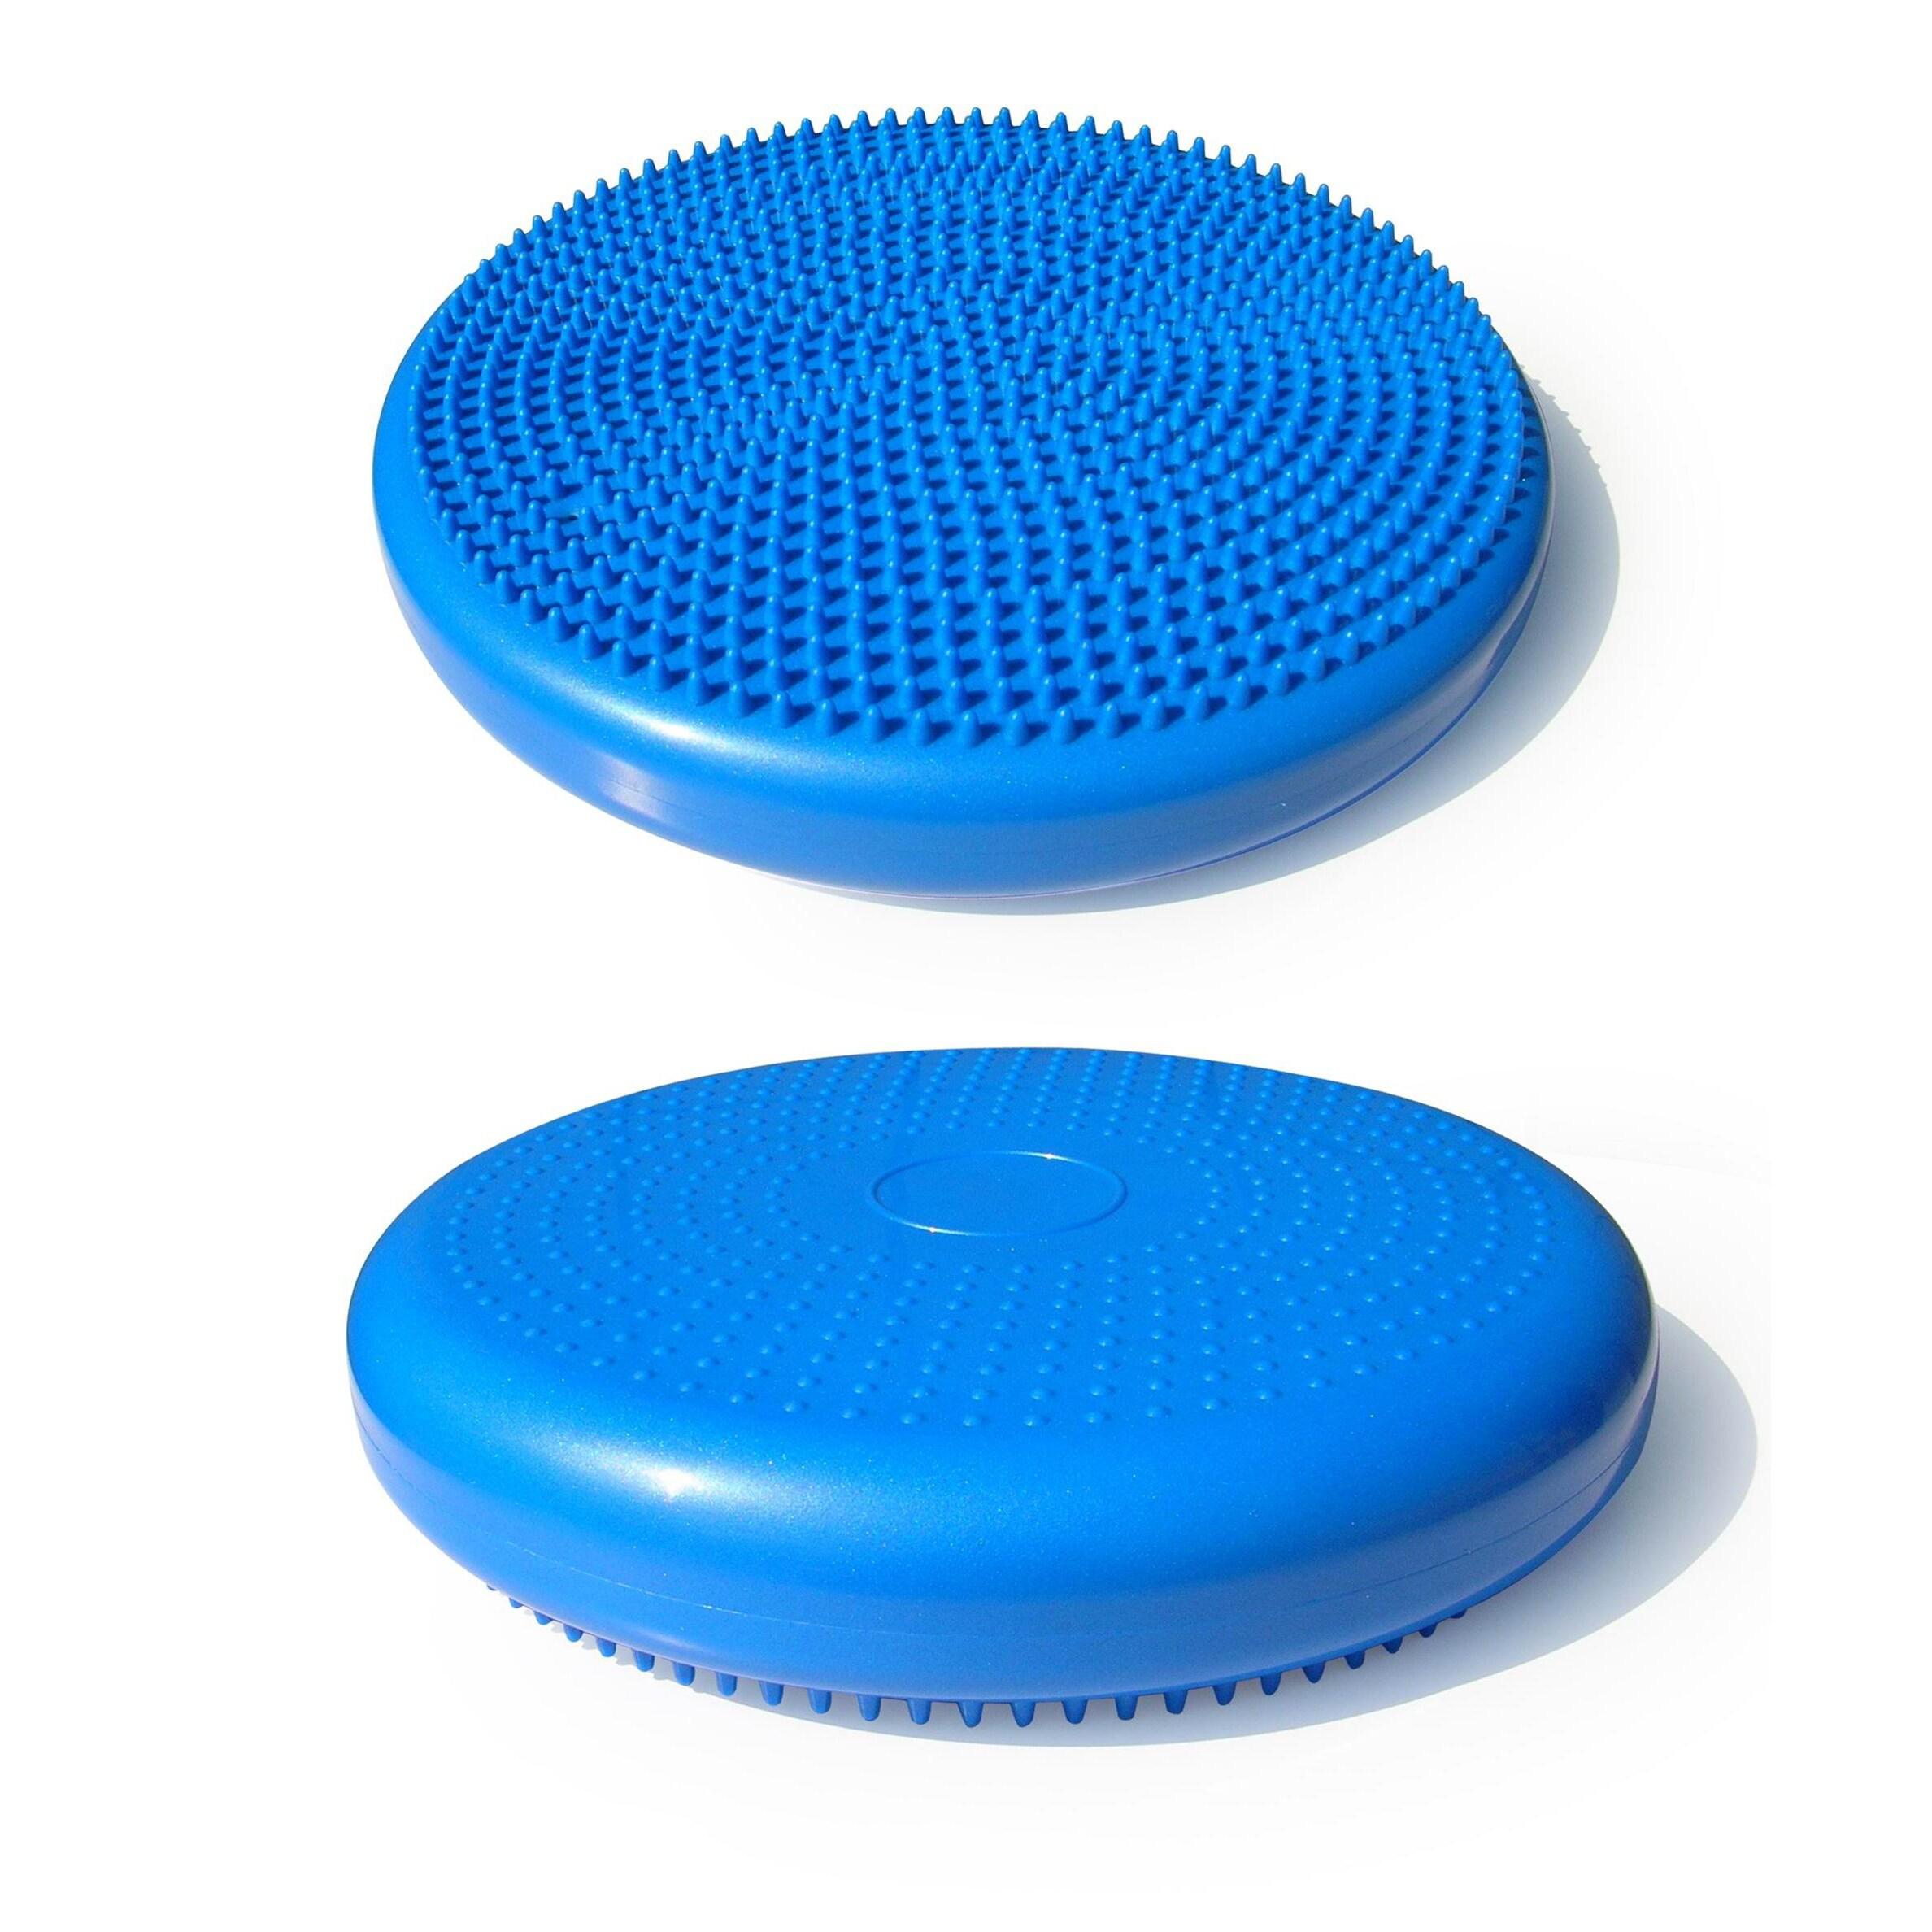 Balance Ball Chair Youtube: Sivan Health And Fitness Blue 35cm Air Cushion Balance